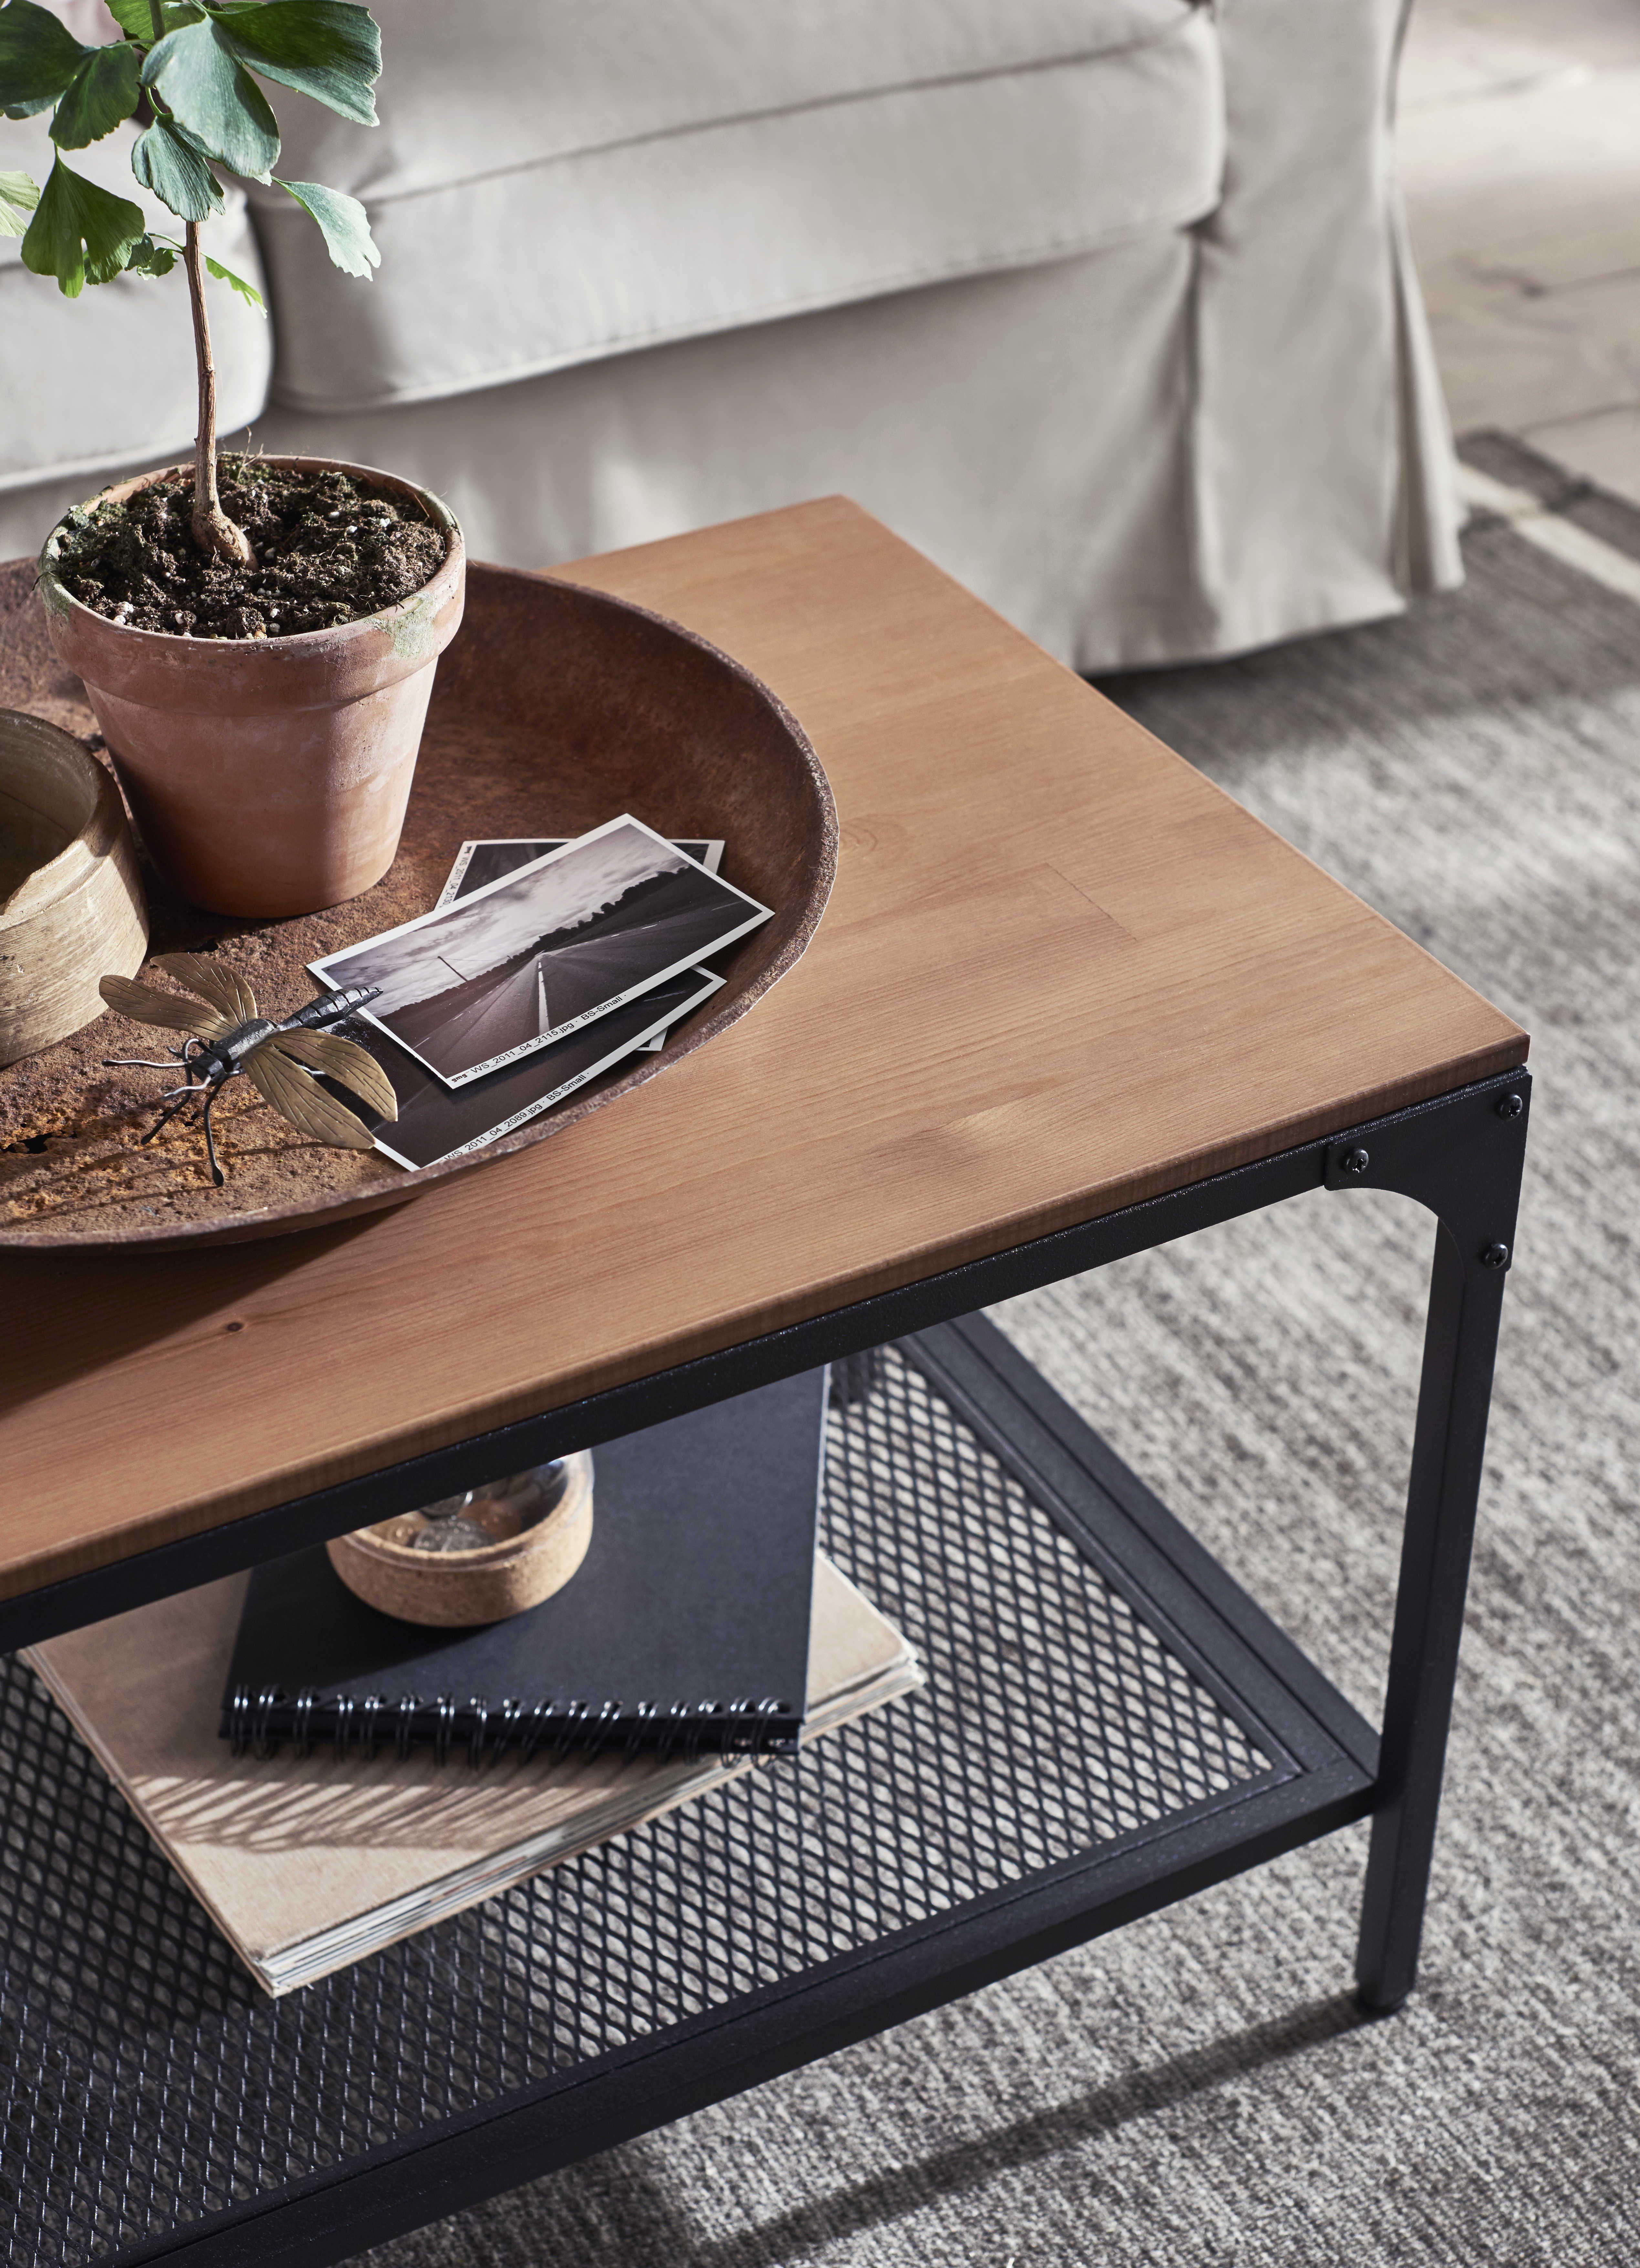 Fjallbo Salontafel Zwart 90x46 Cm Ikea Koffietafel Salontafel Houten Salontafels [ 7021 x 5077 Pixel ]